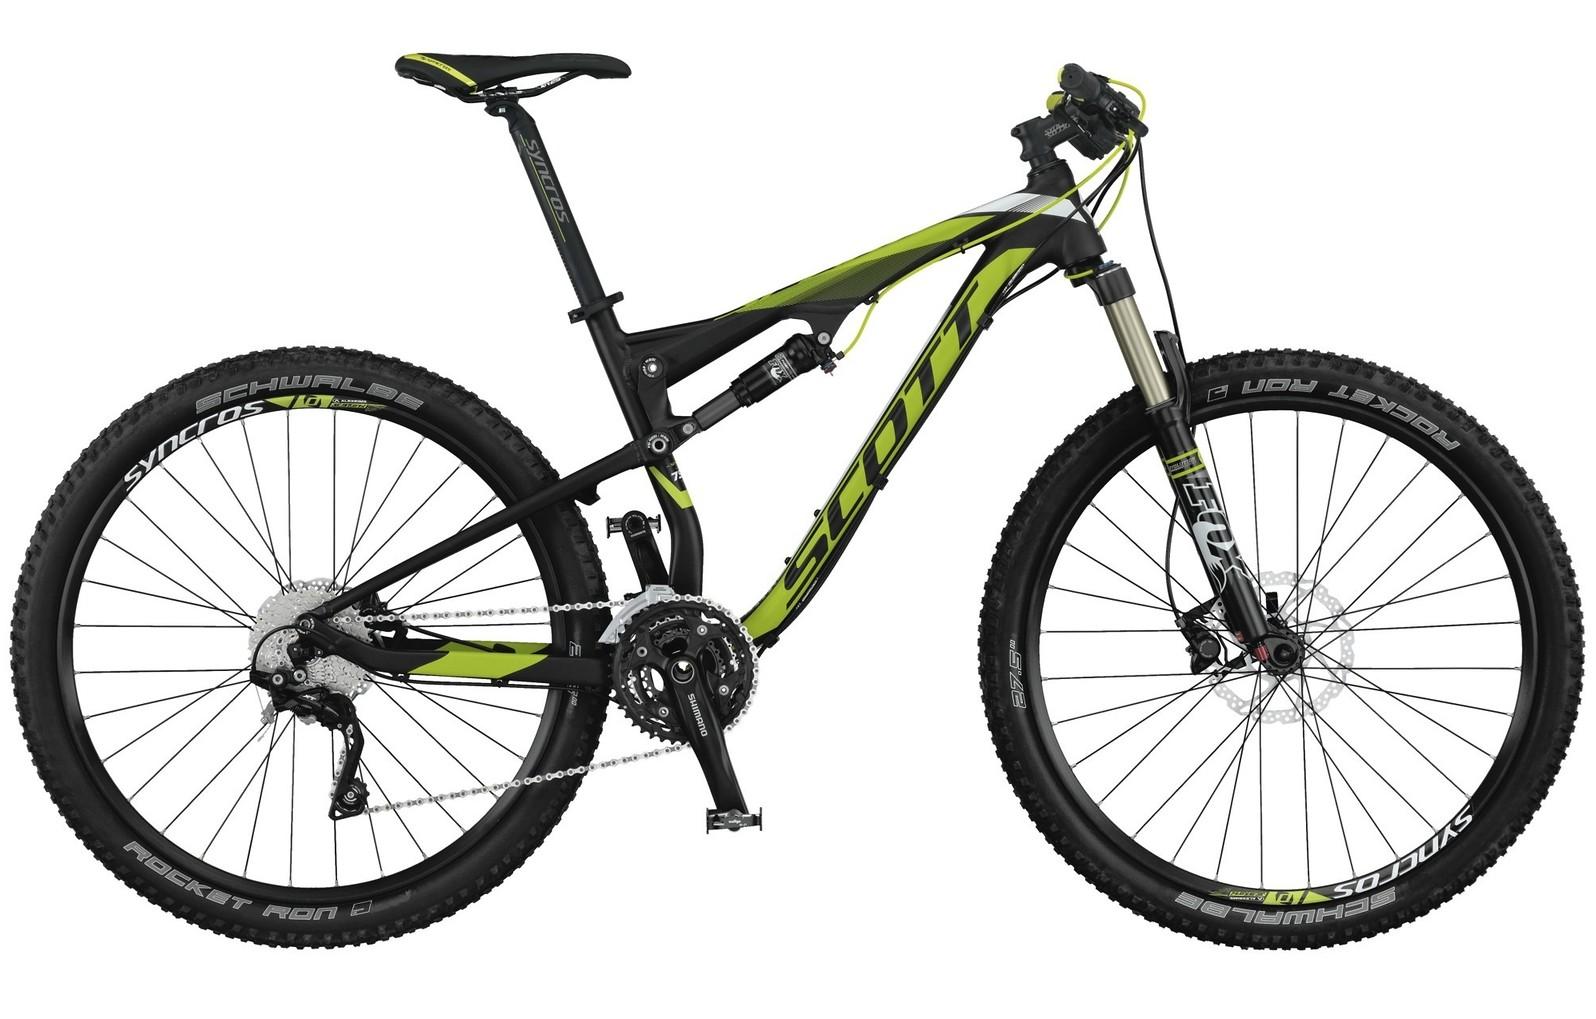 Jual Sepeda Scott Spark 750 27.5 2014 Mountain Bike